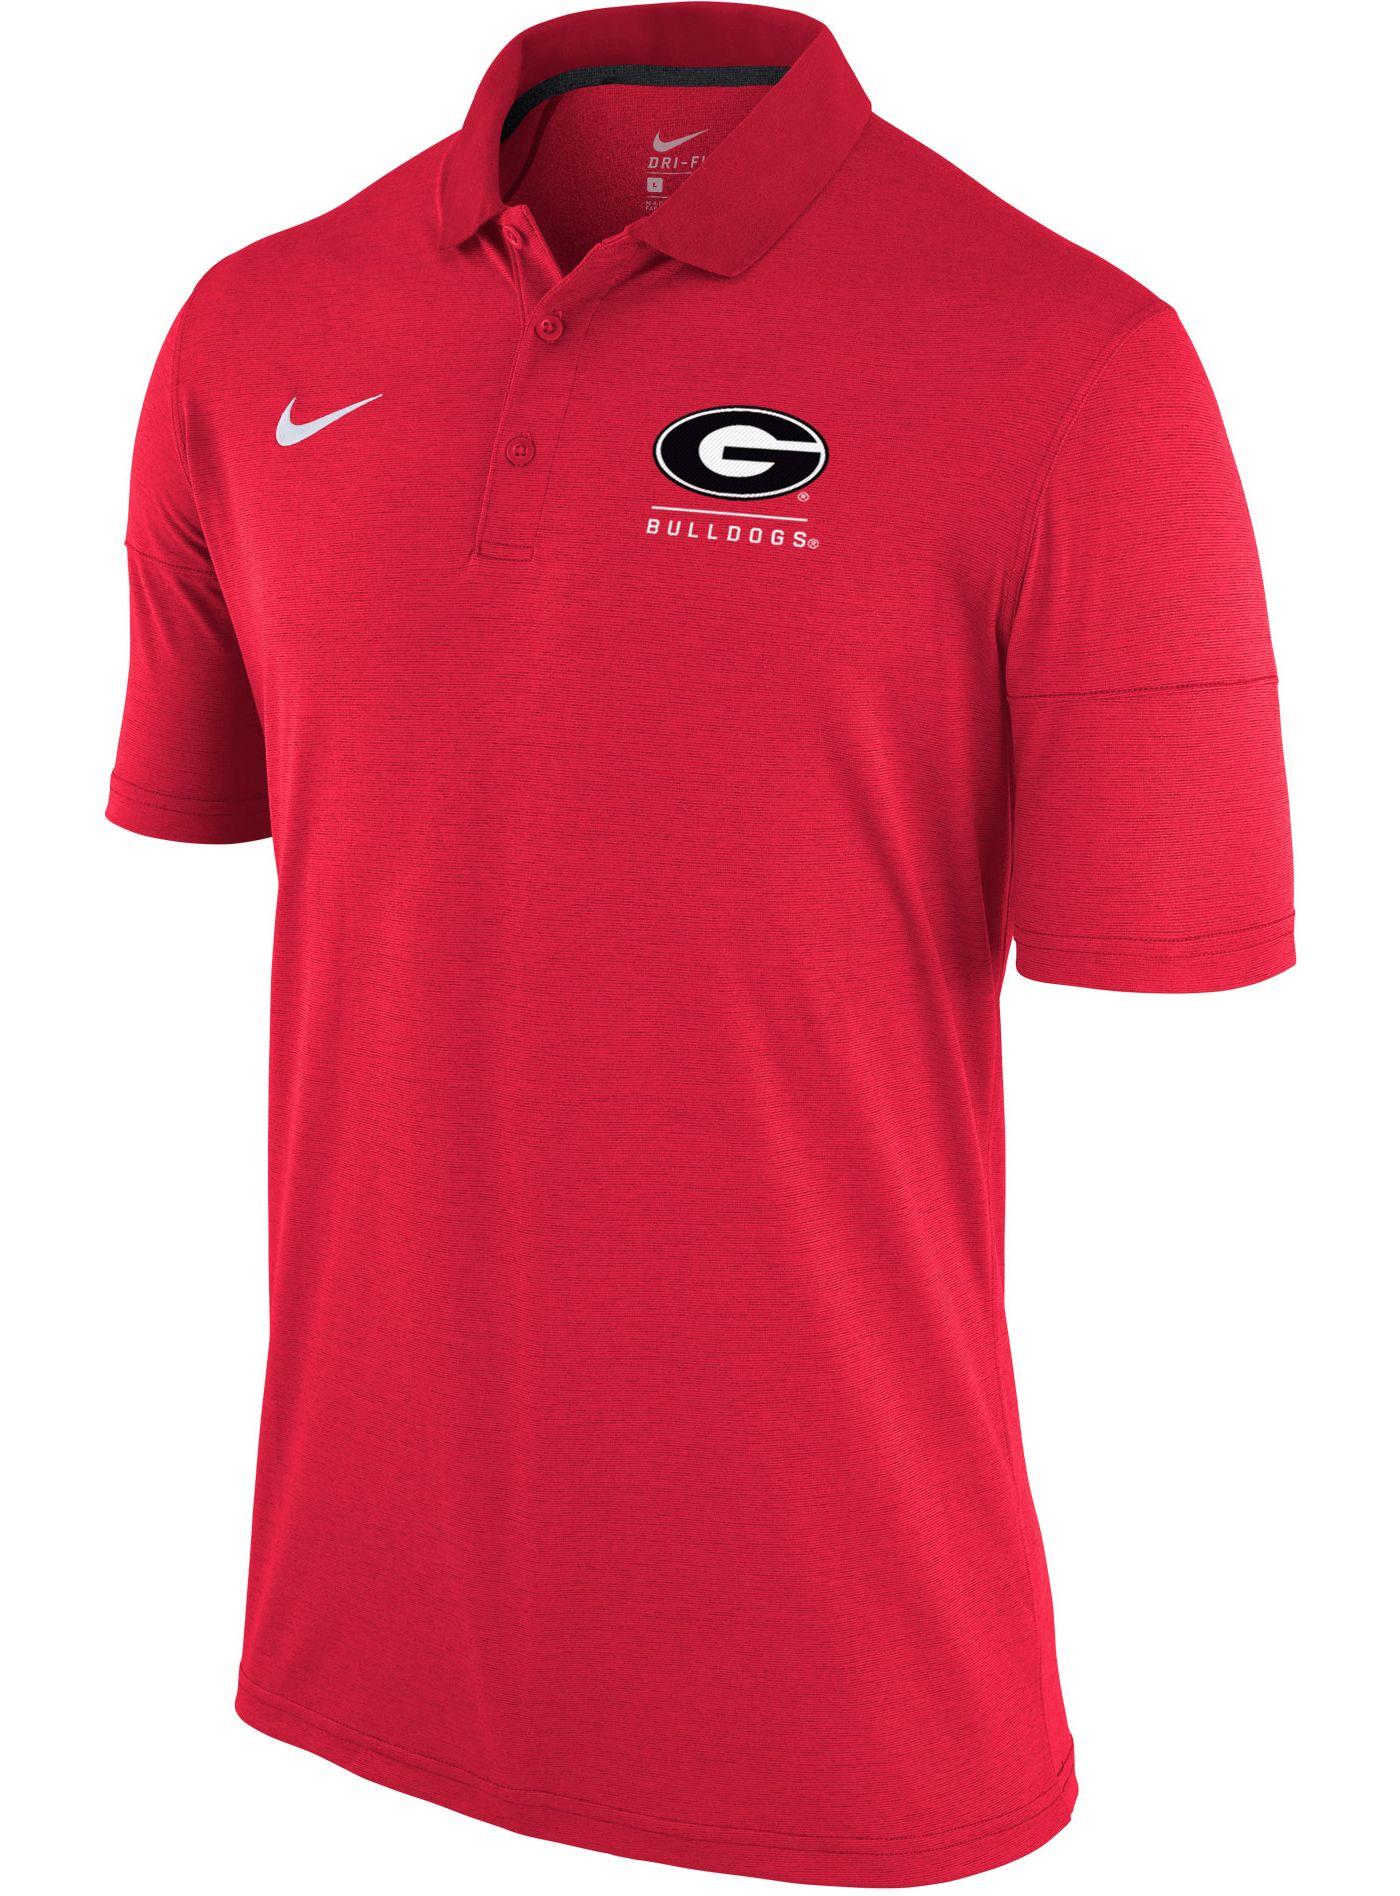 Nike Men's Georgia Bulldogs Red Dry Lightweight Polo